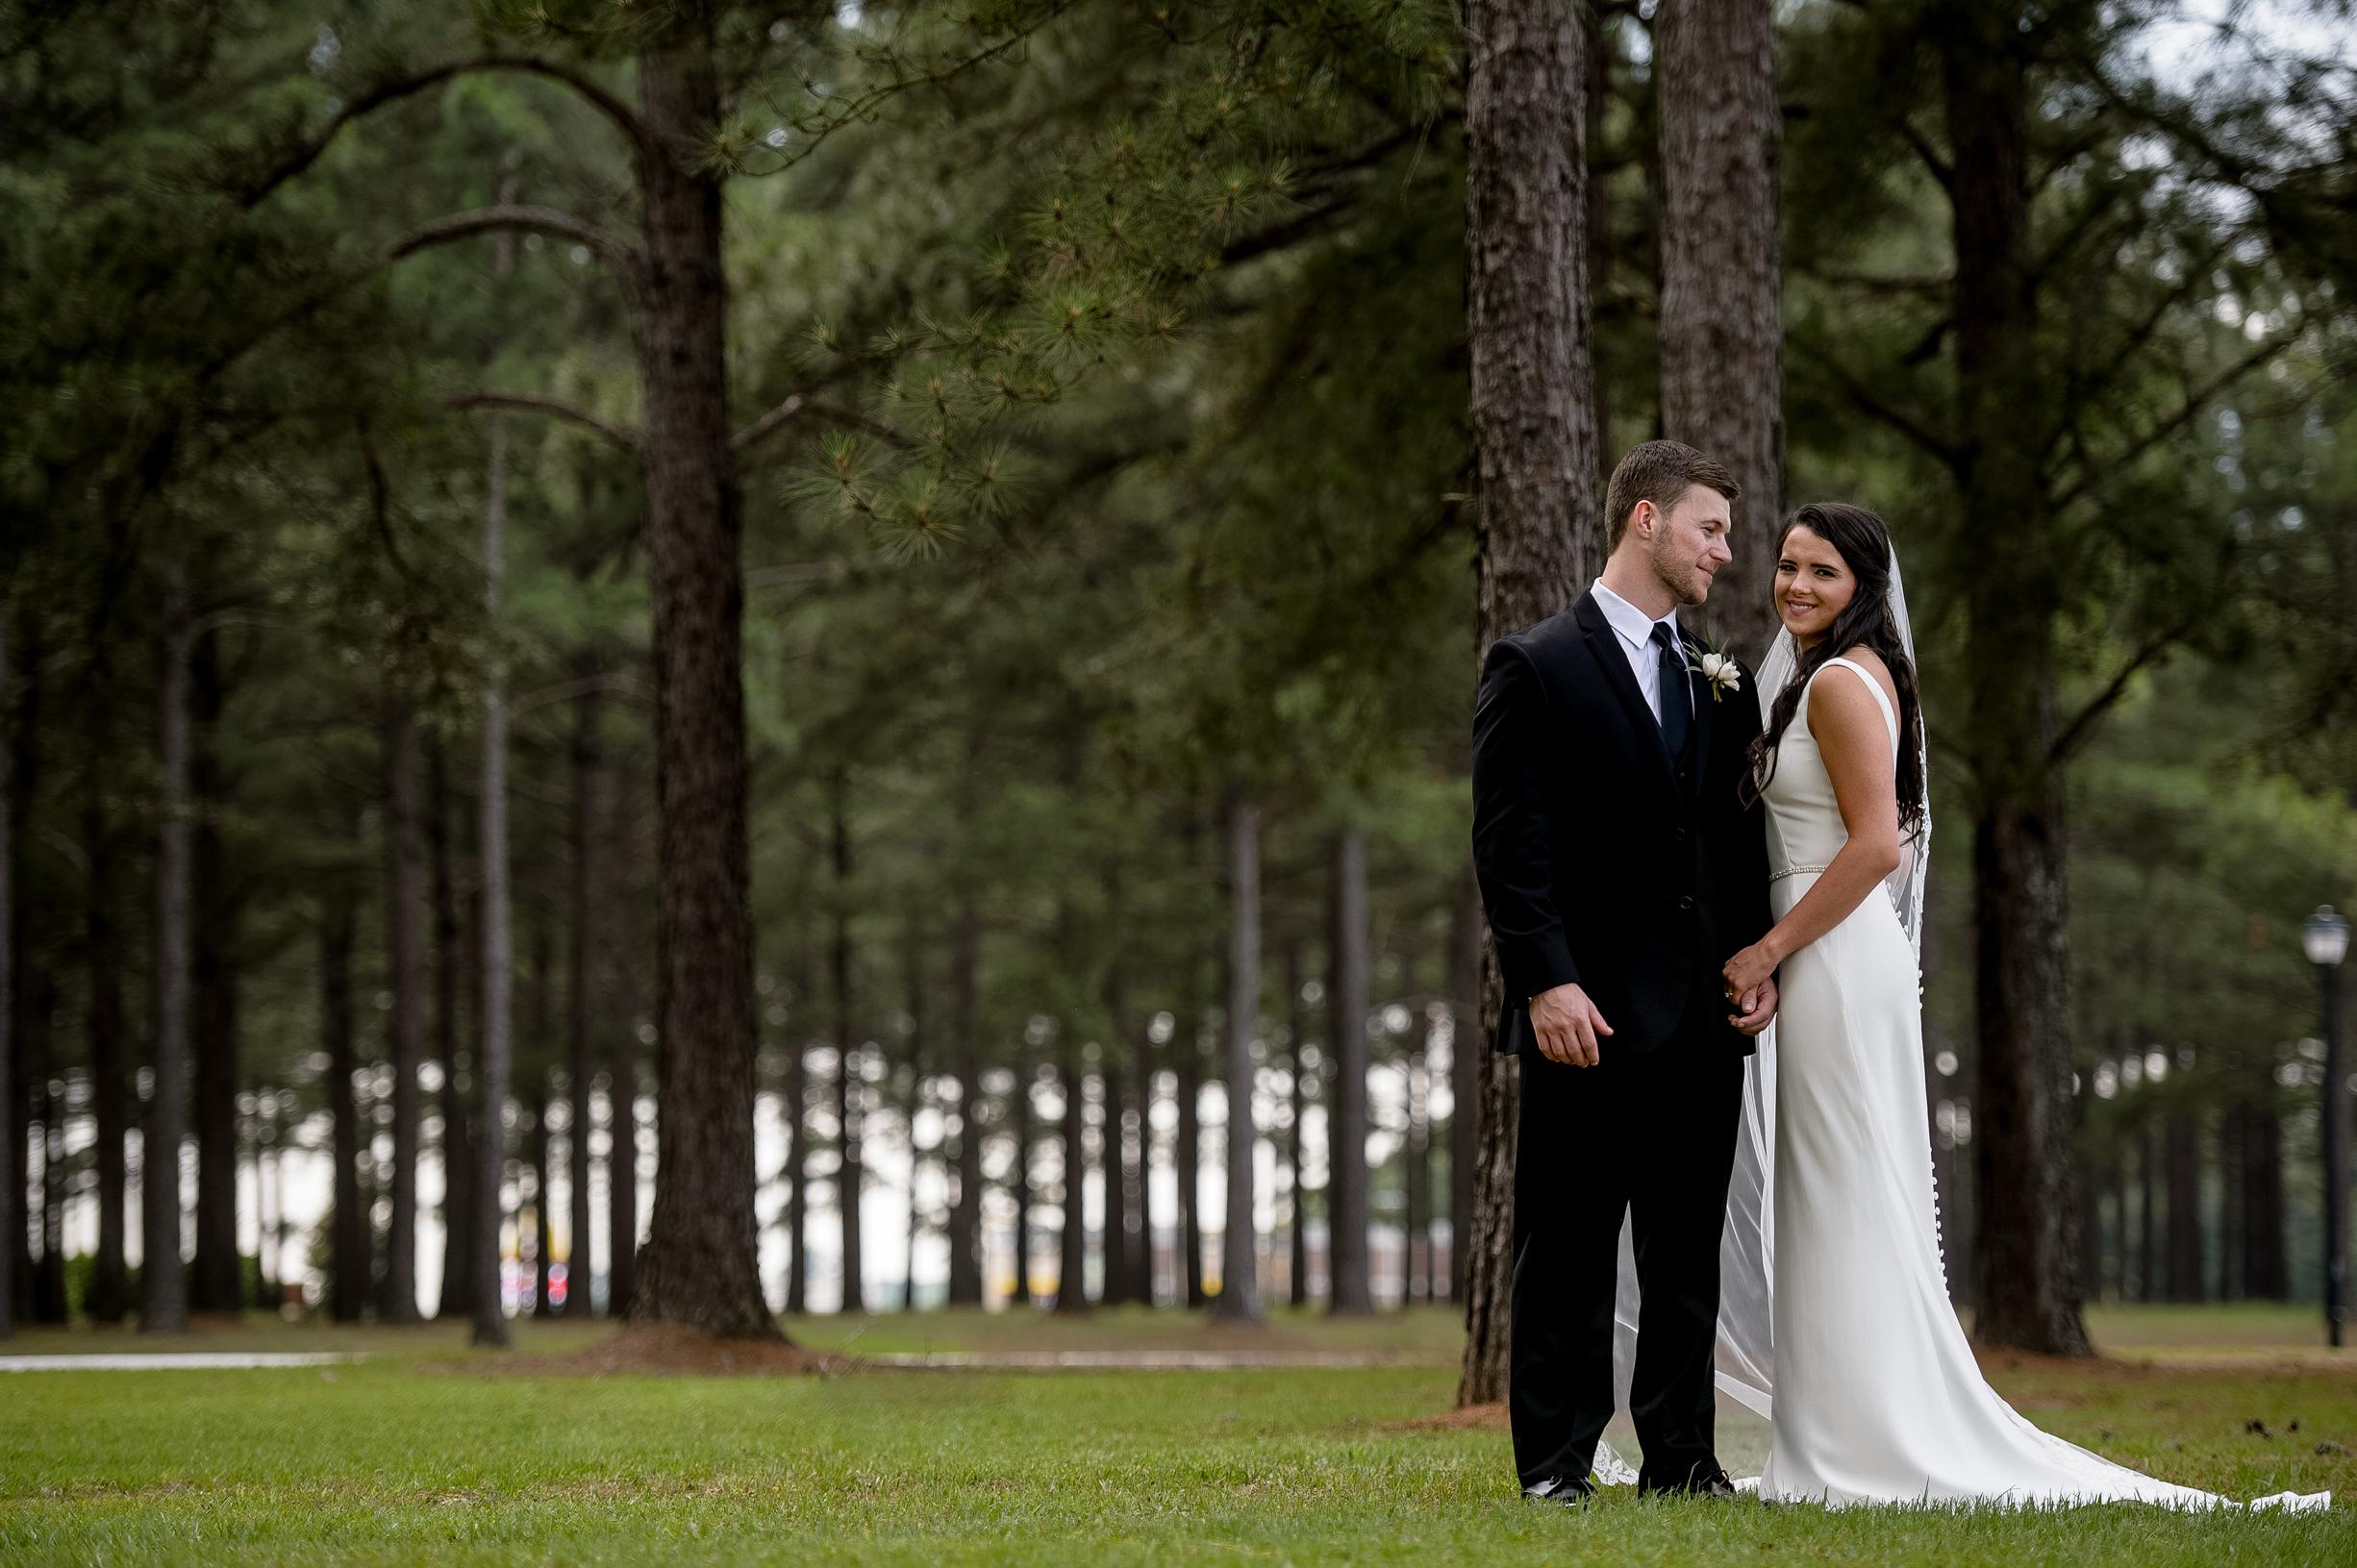 Royal Wedding with Outdoor Reception-27.JPG